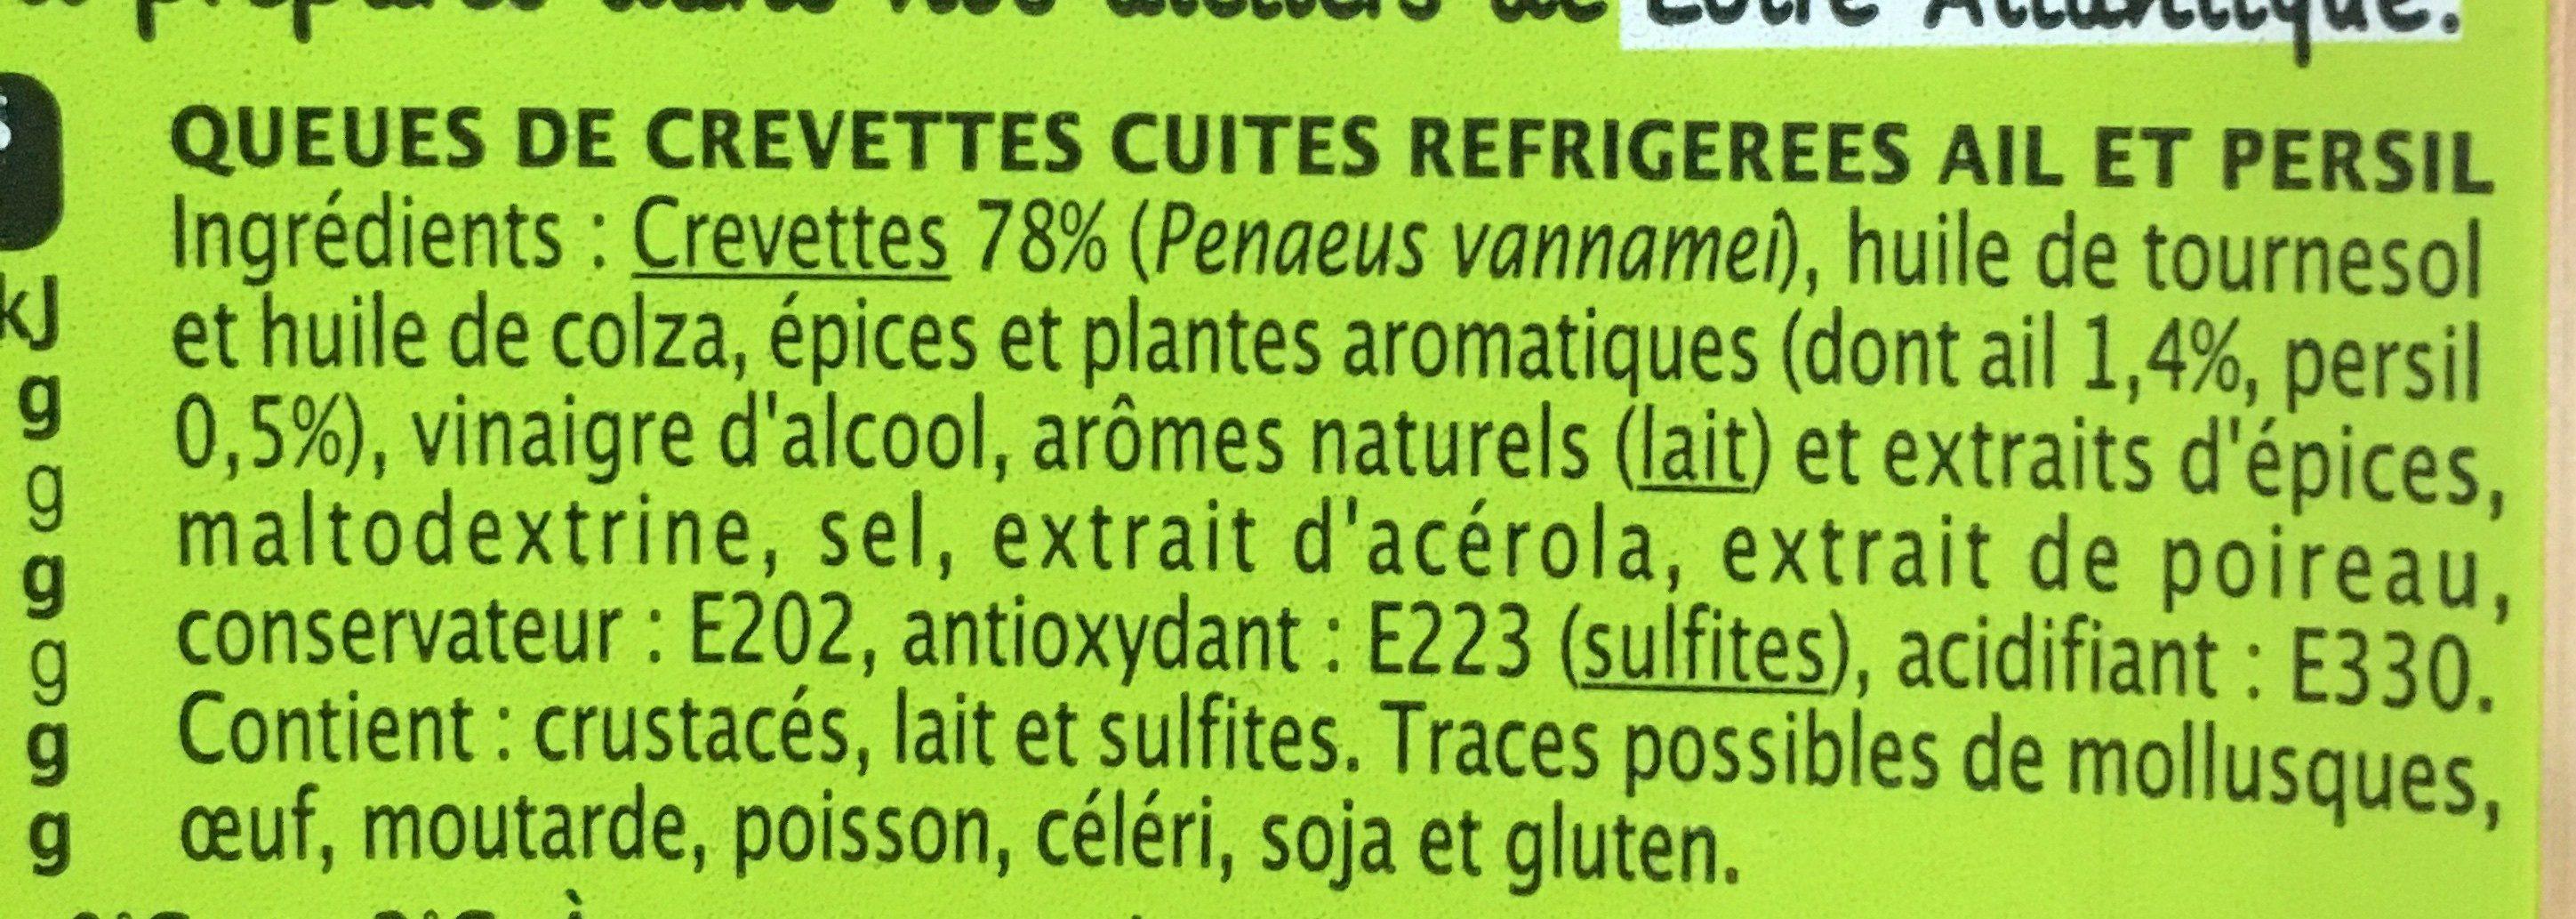 Queues de crevettes marinées ail & persil - Ingrediënten - fr